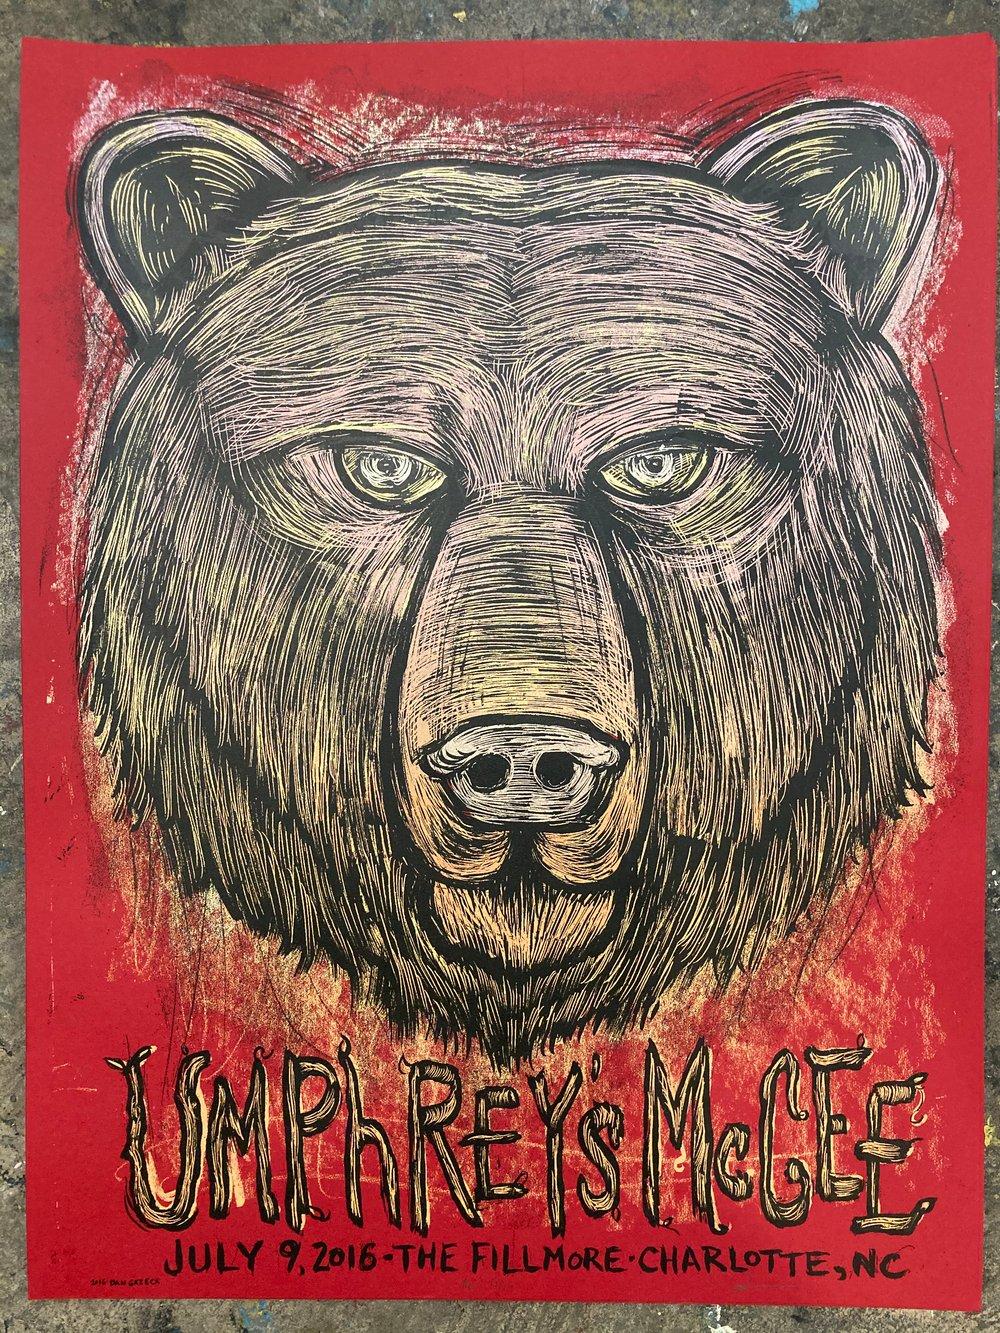 Umphreys McGee 2016 Charlotte N.C. poster